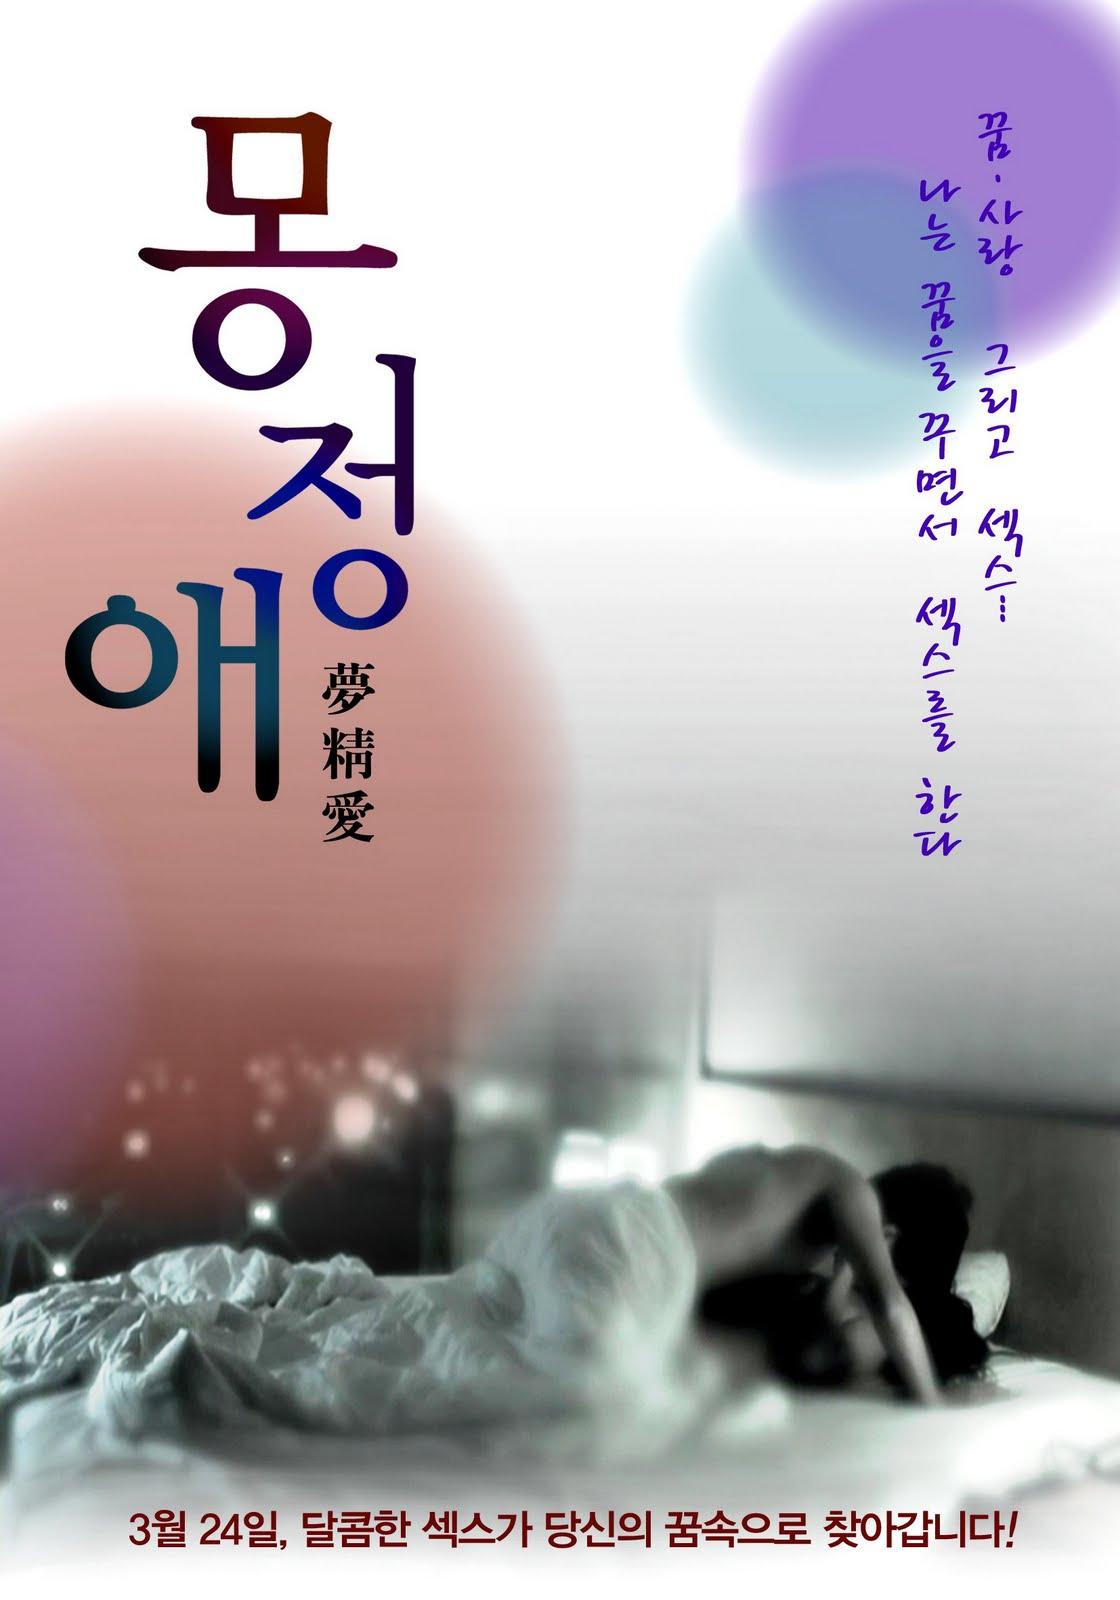 Dream Affection Full Korea 18+ Adult Movie Online Free